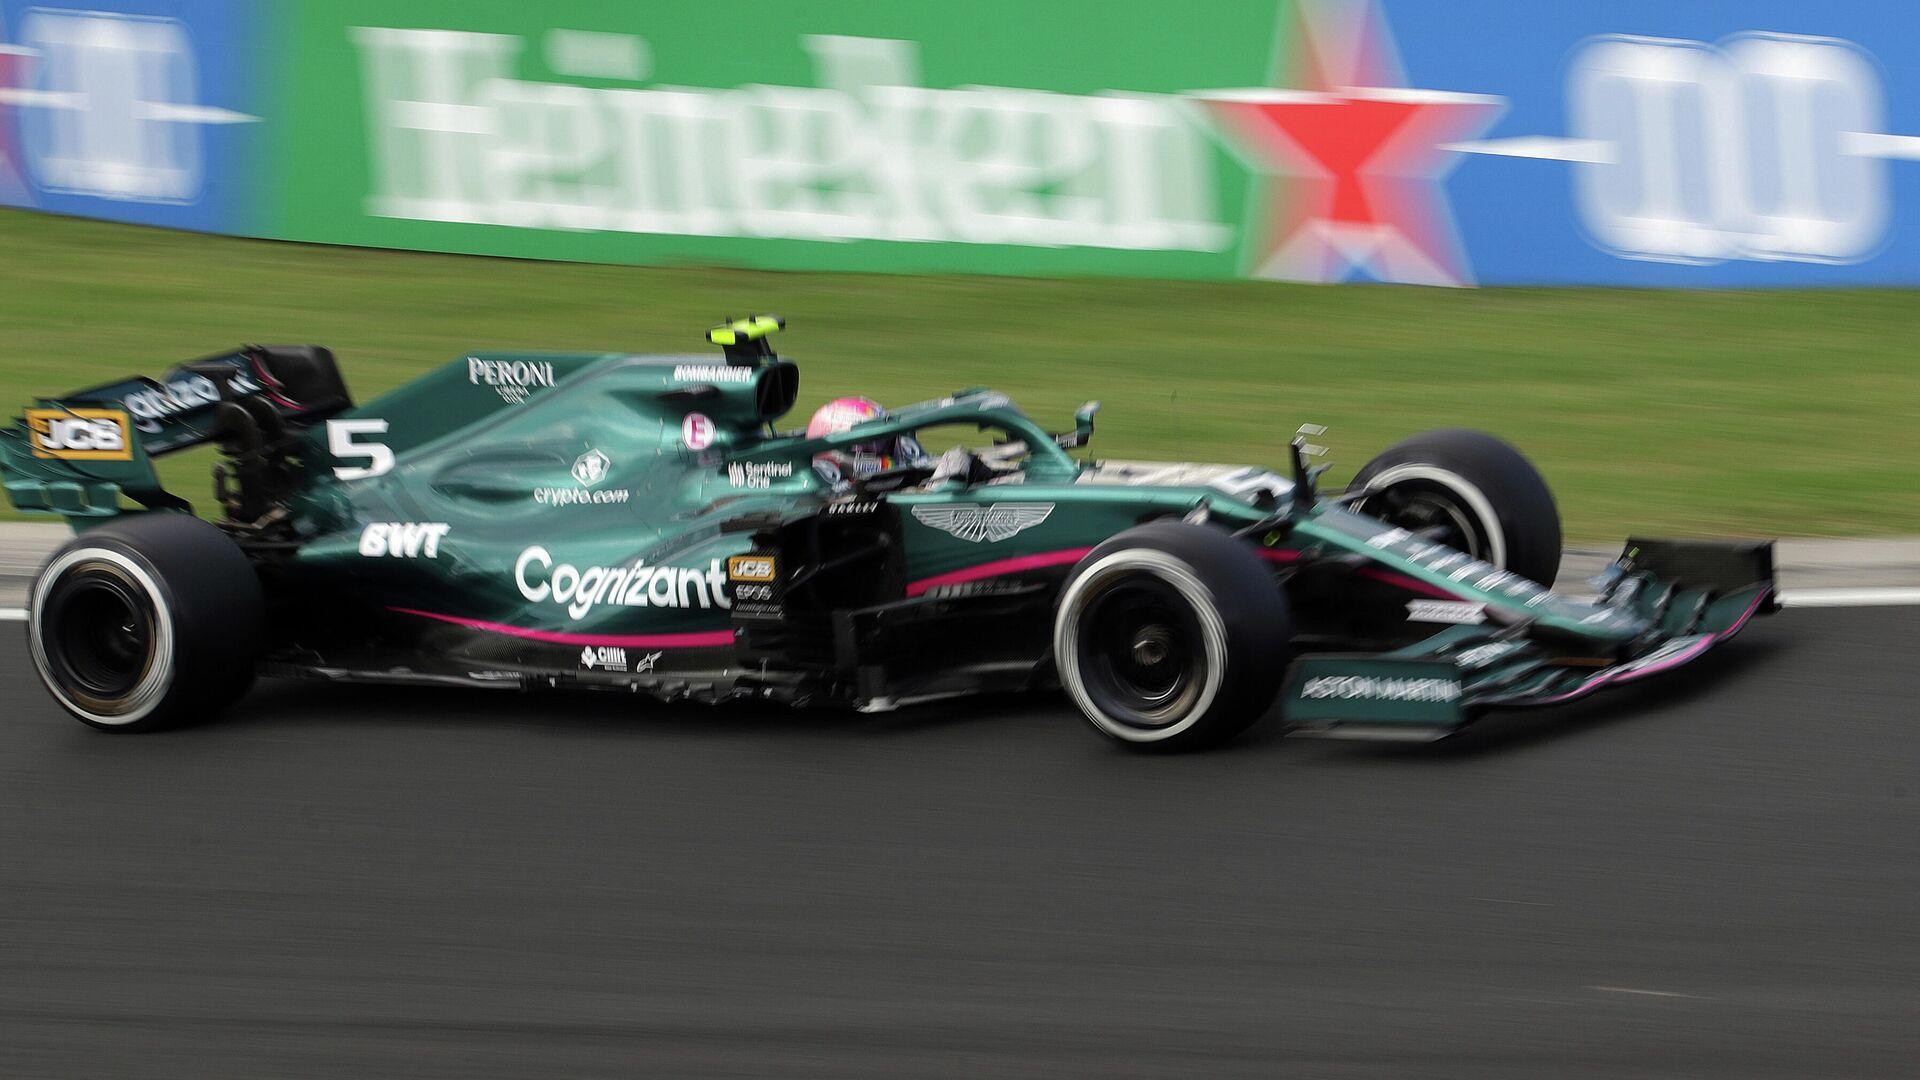 Formula One F1 - Hungarian Grand Prix - Hungaroring, Budapest, Hungary - August 1, 2021 Aston Martin's Sebastian Vettel in action REUTERS/Florion Goga - РИА Новости, 1920, 02.08.2021